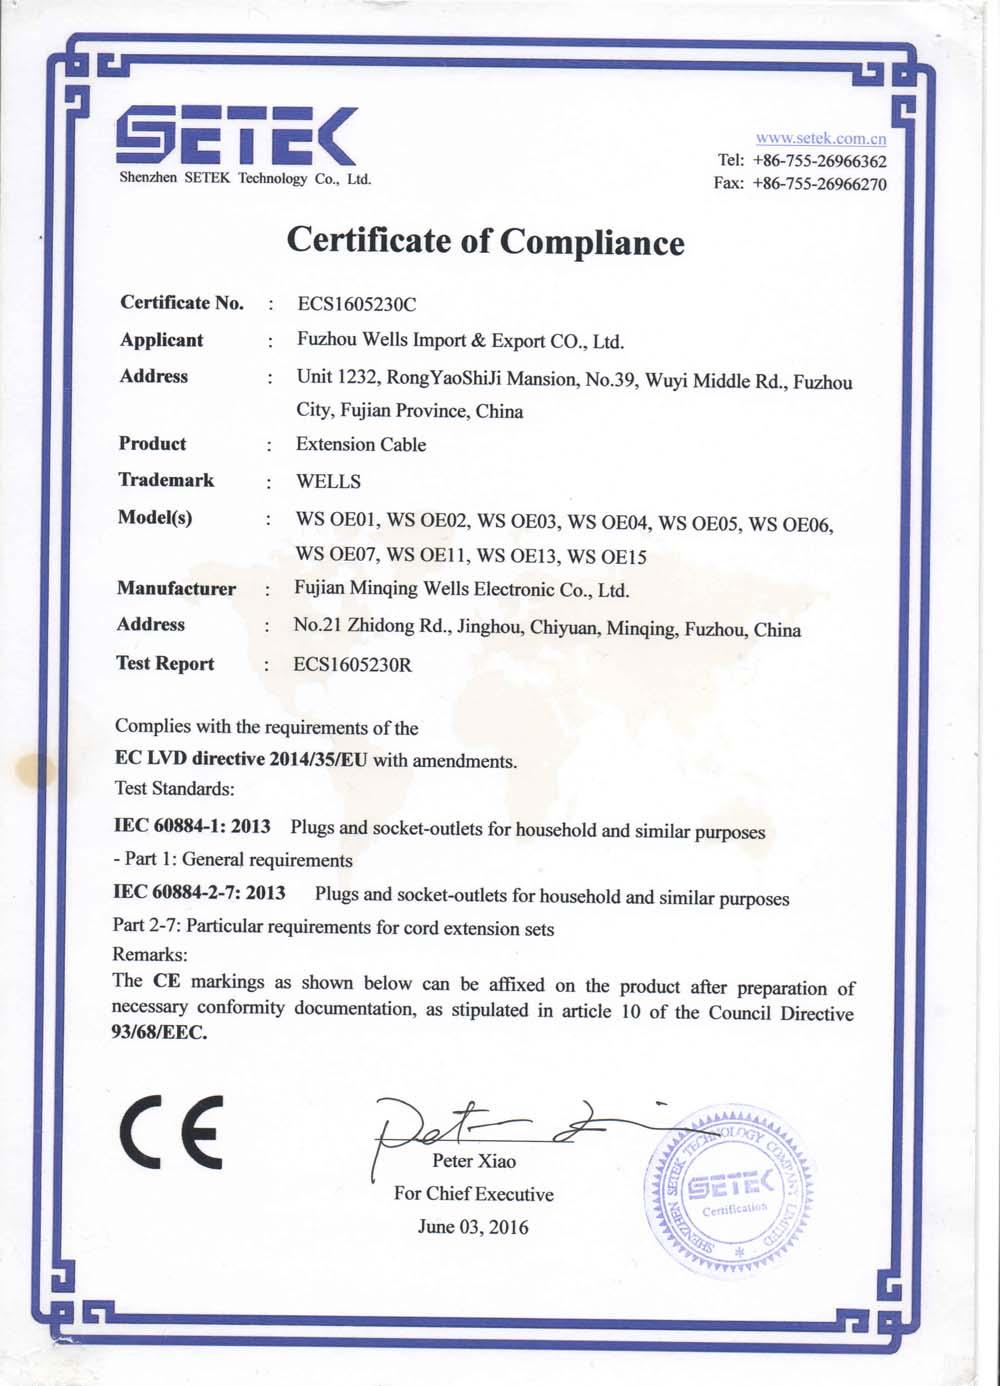 Company Overview - Fujian Minqing Wells Electronic Co , Ltd